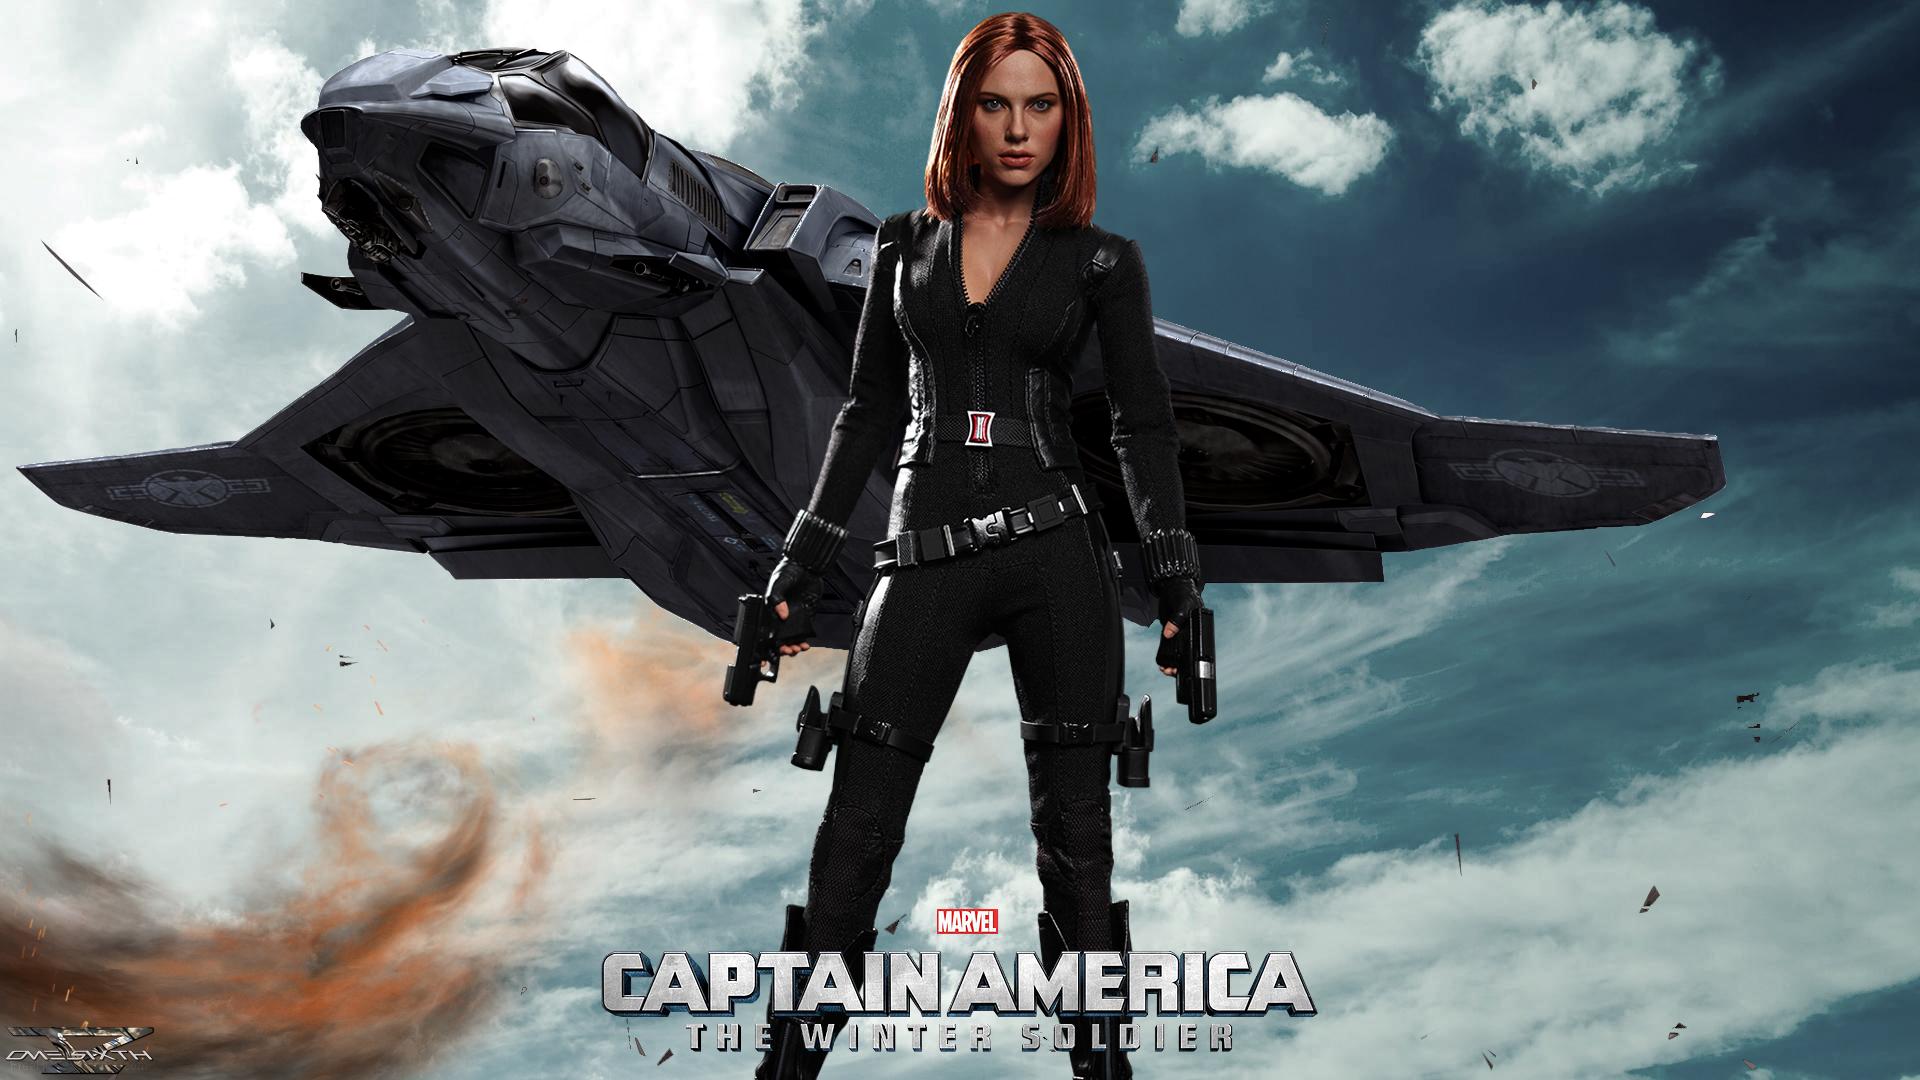 Captain America The Winter Soldier Wallpaper: Black Widow Spider Wallpaper